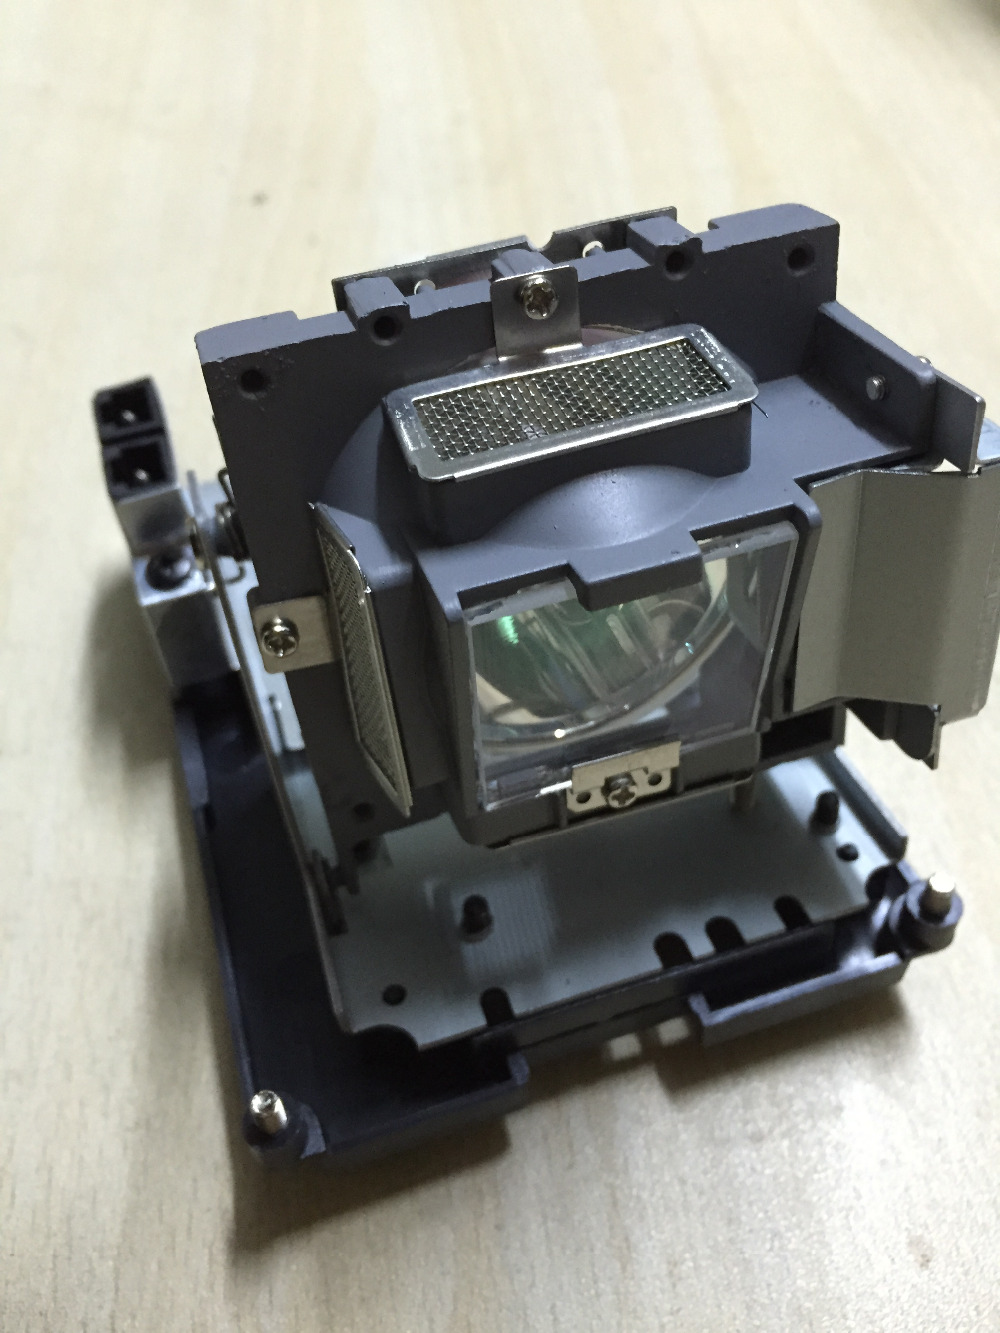 Compatible projector Lamp With housing FOR 5J.J0W05.001 W1000 W1000+ W1050 p-vip 180/0.8 E20.8 rlc 072 p vip 180 0 8 e20 8 original projector lamp with housing for pjd5233 pjd5353 pjd5523w